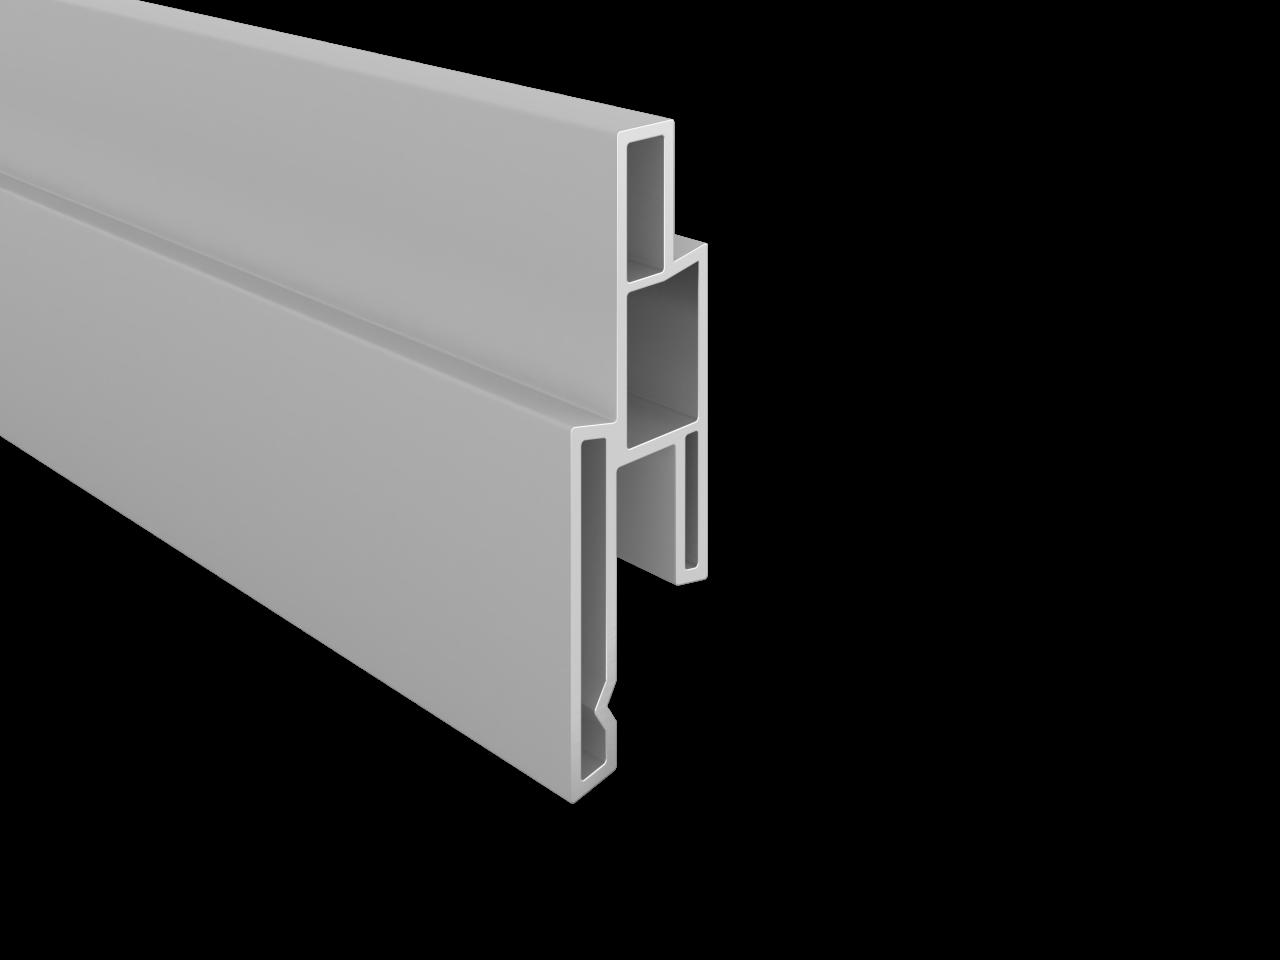 BALTIC-Serie KS-Dekorleiste 14 x 25 x 1760 mm, SILBERGRAU